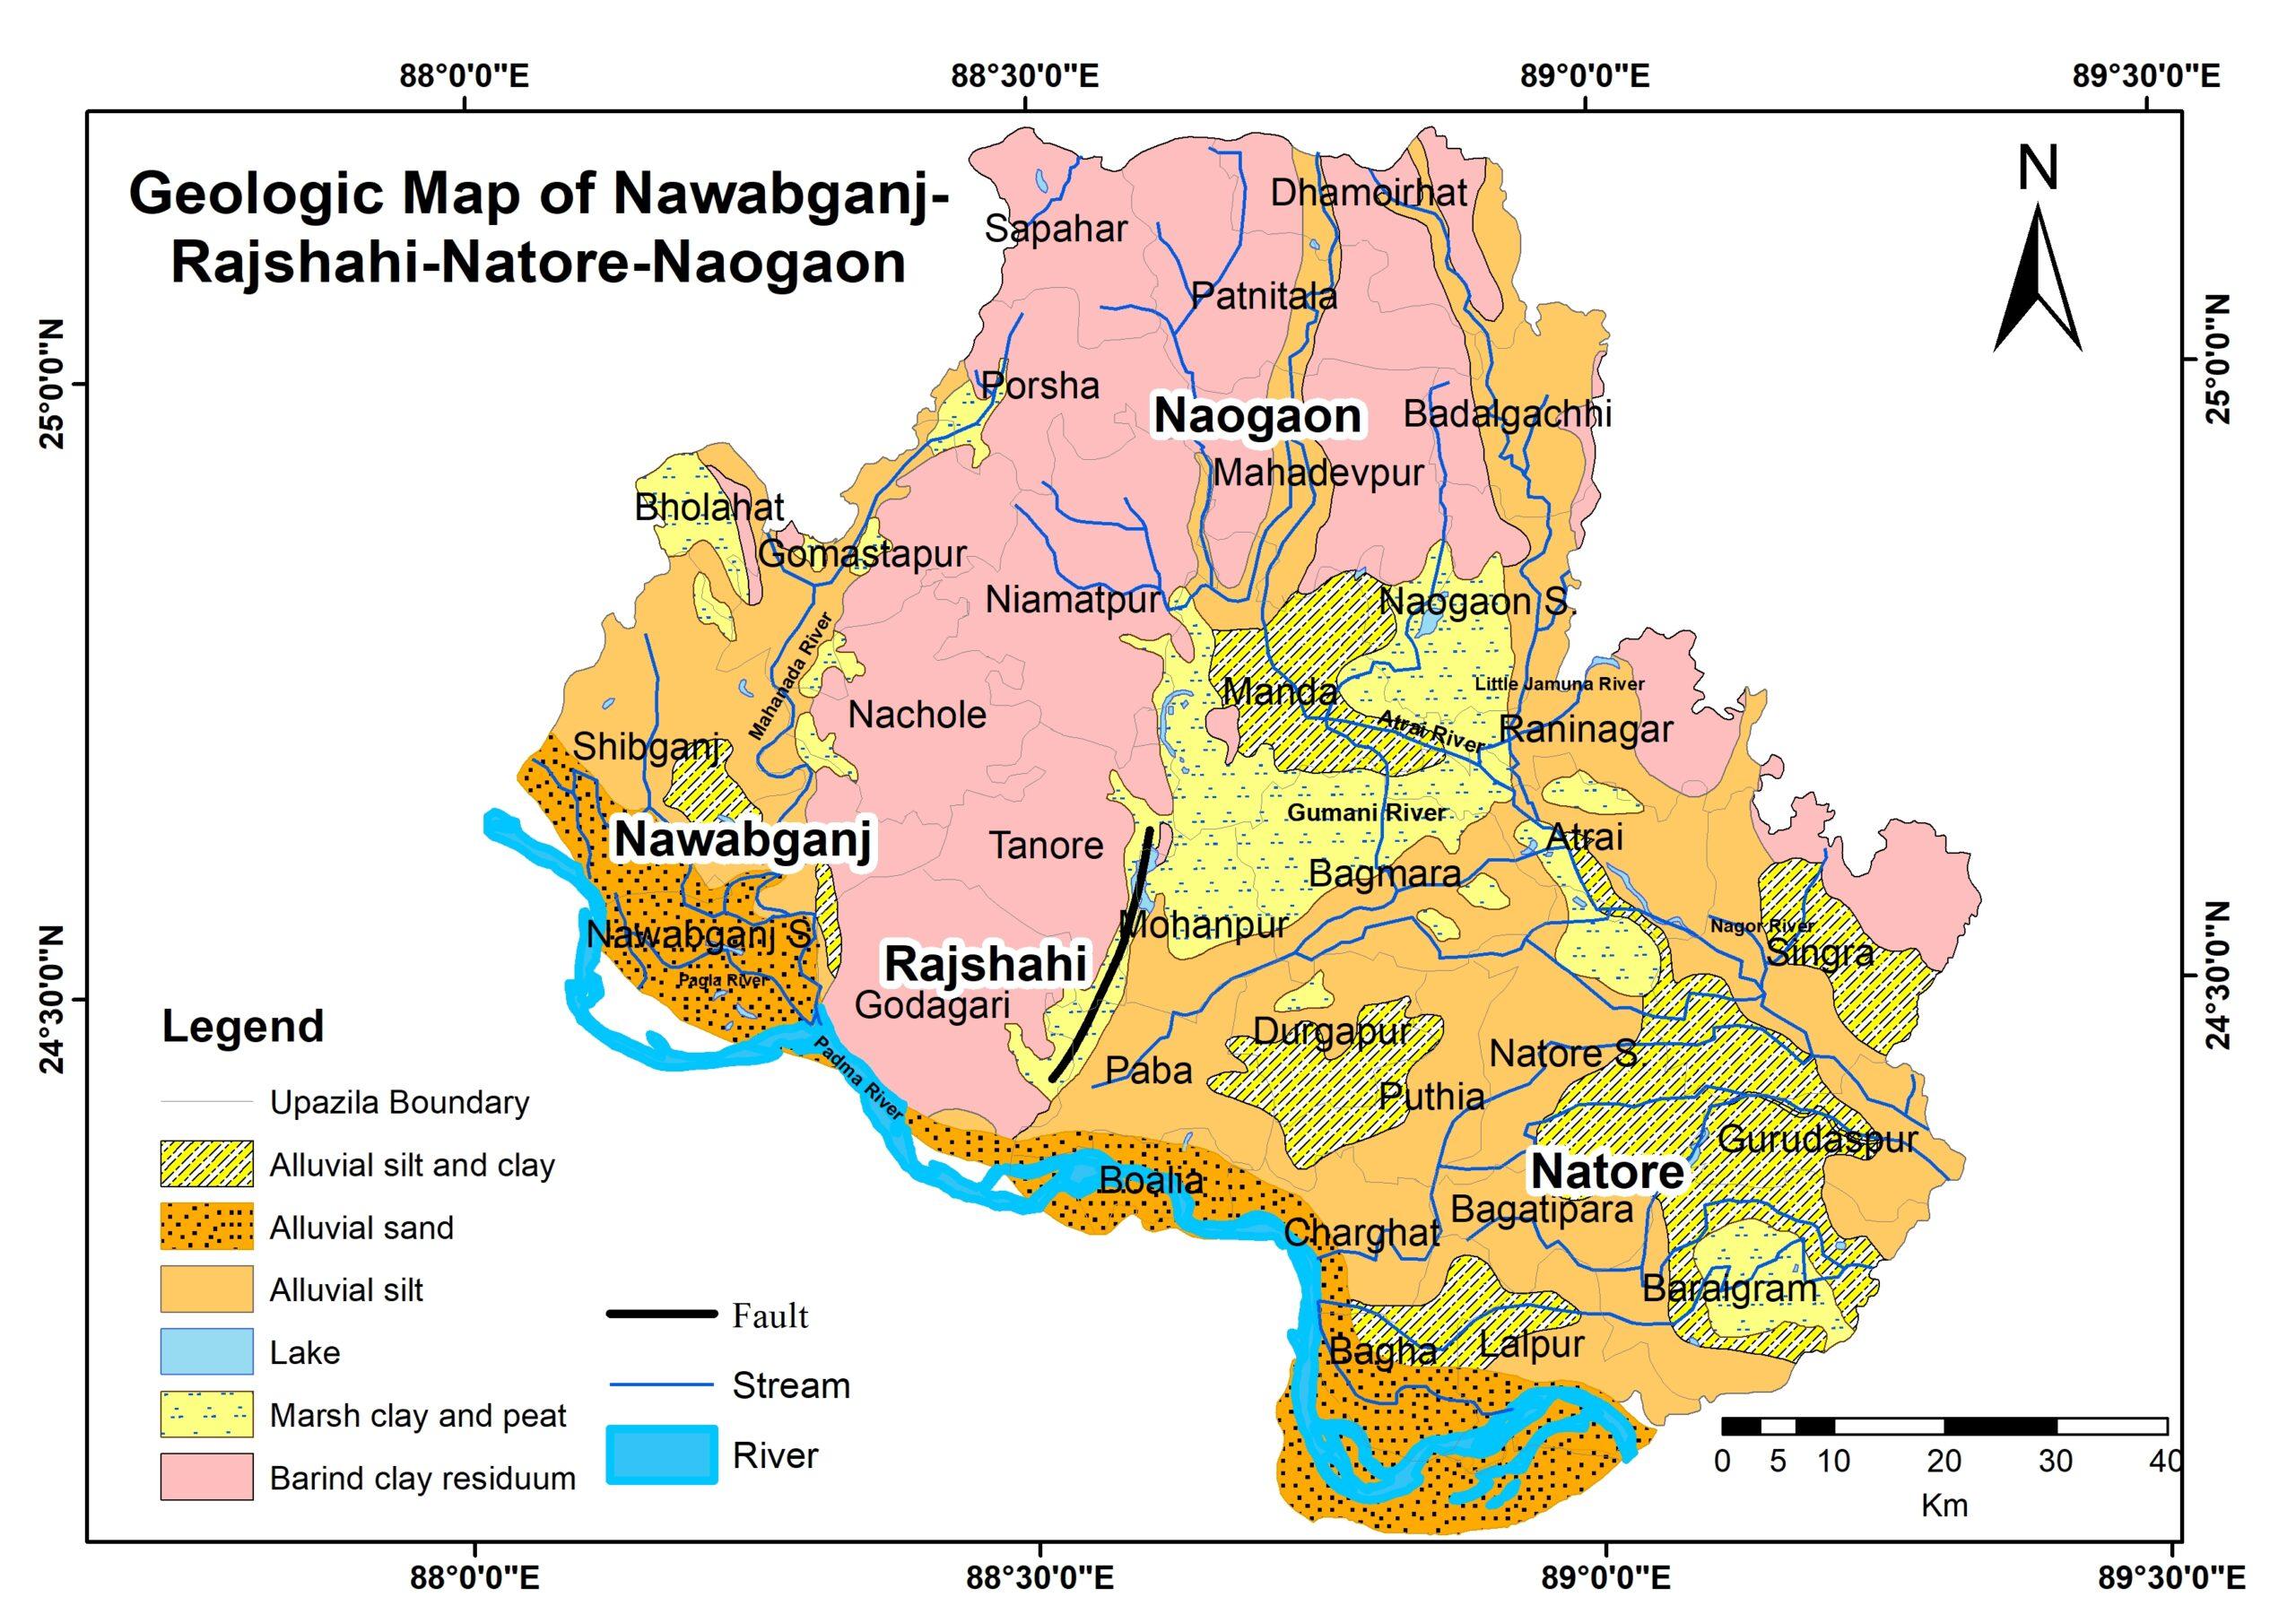 Geologic Map of Nawabganj-Rajshahi-Natore-Naogaon